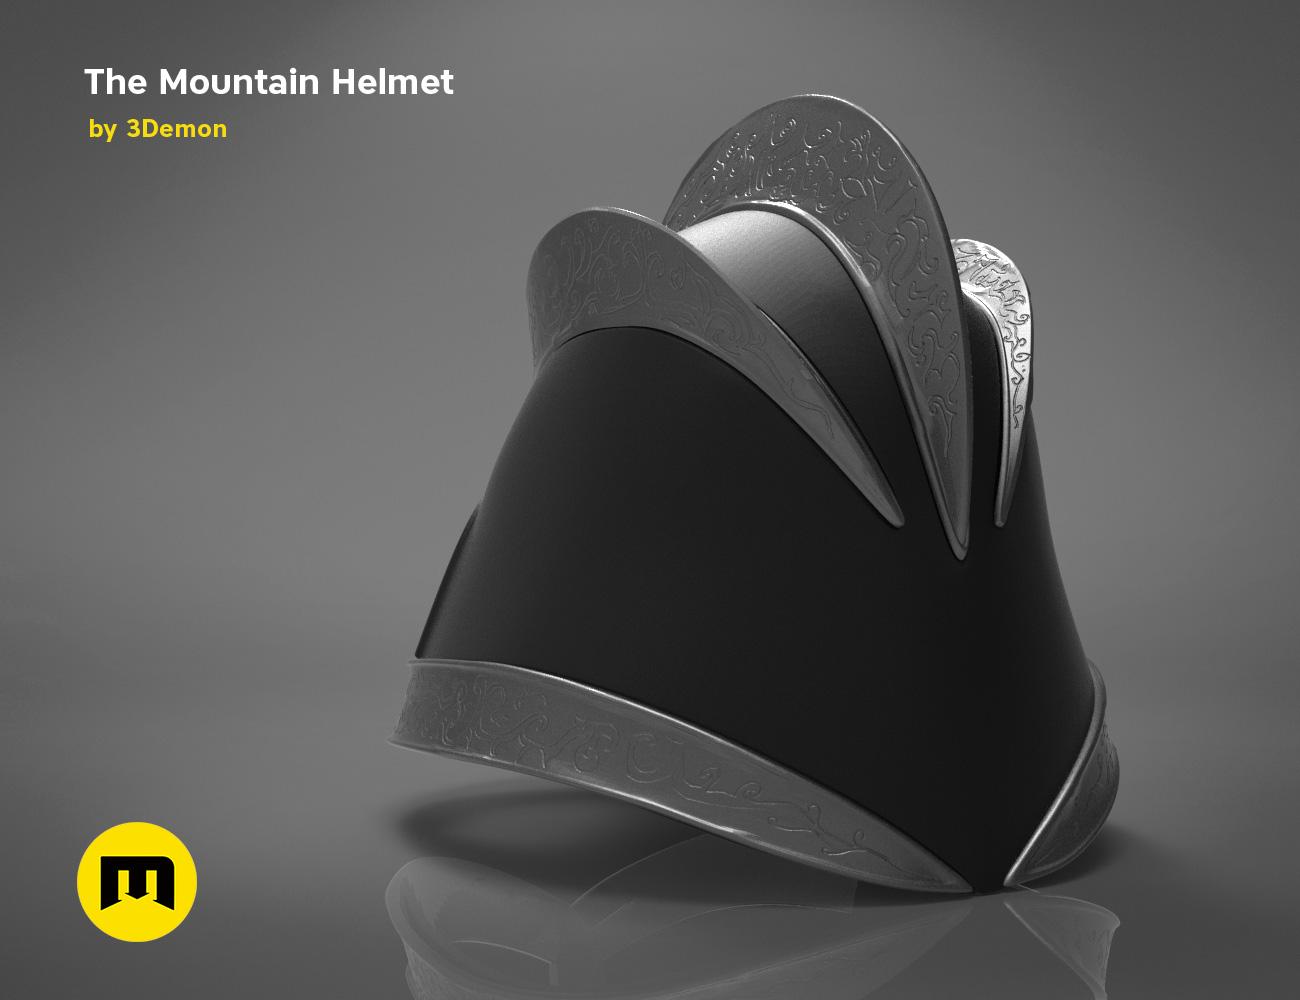 GoT-mountain-helmet-color.646.jpg Download STL file The Mountain Helmet – Game of Thrones • 3D printing model, 3D-mon